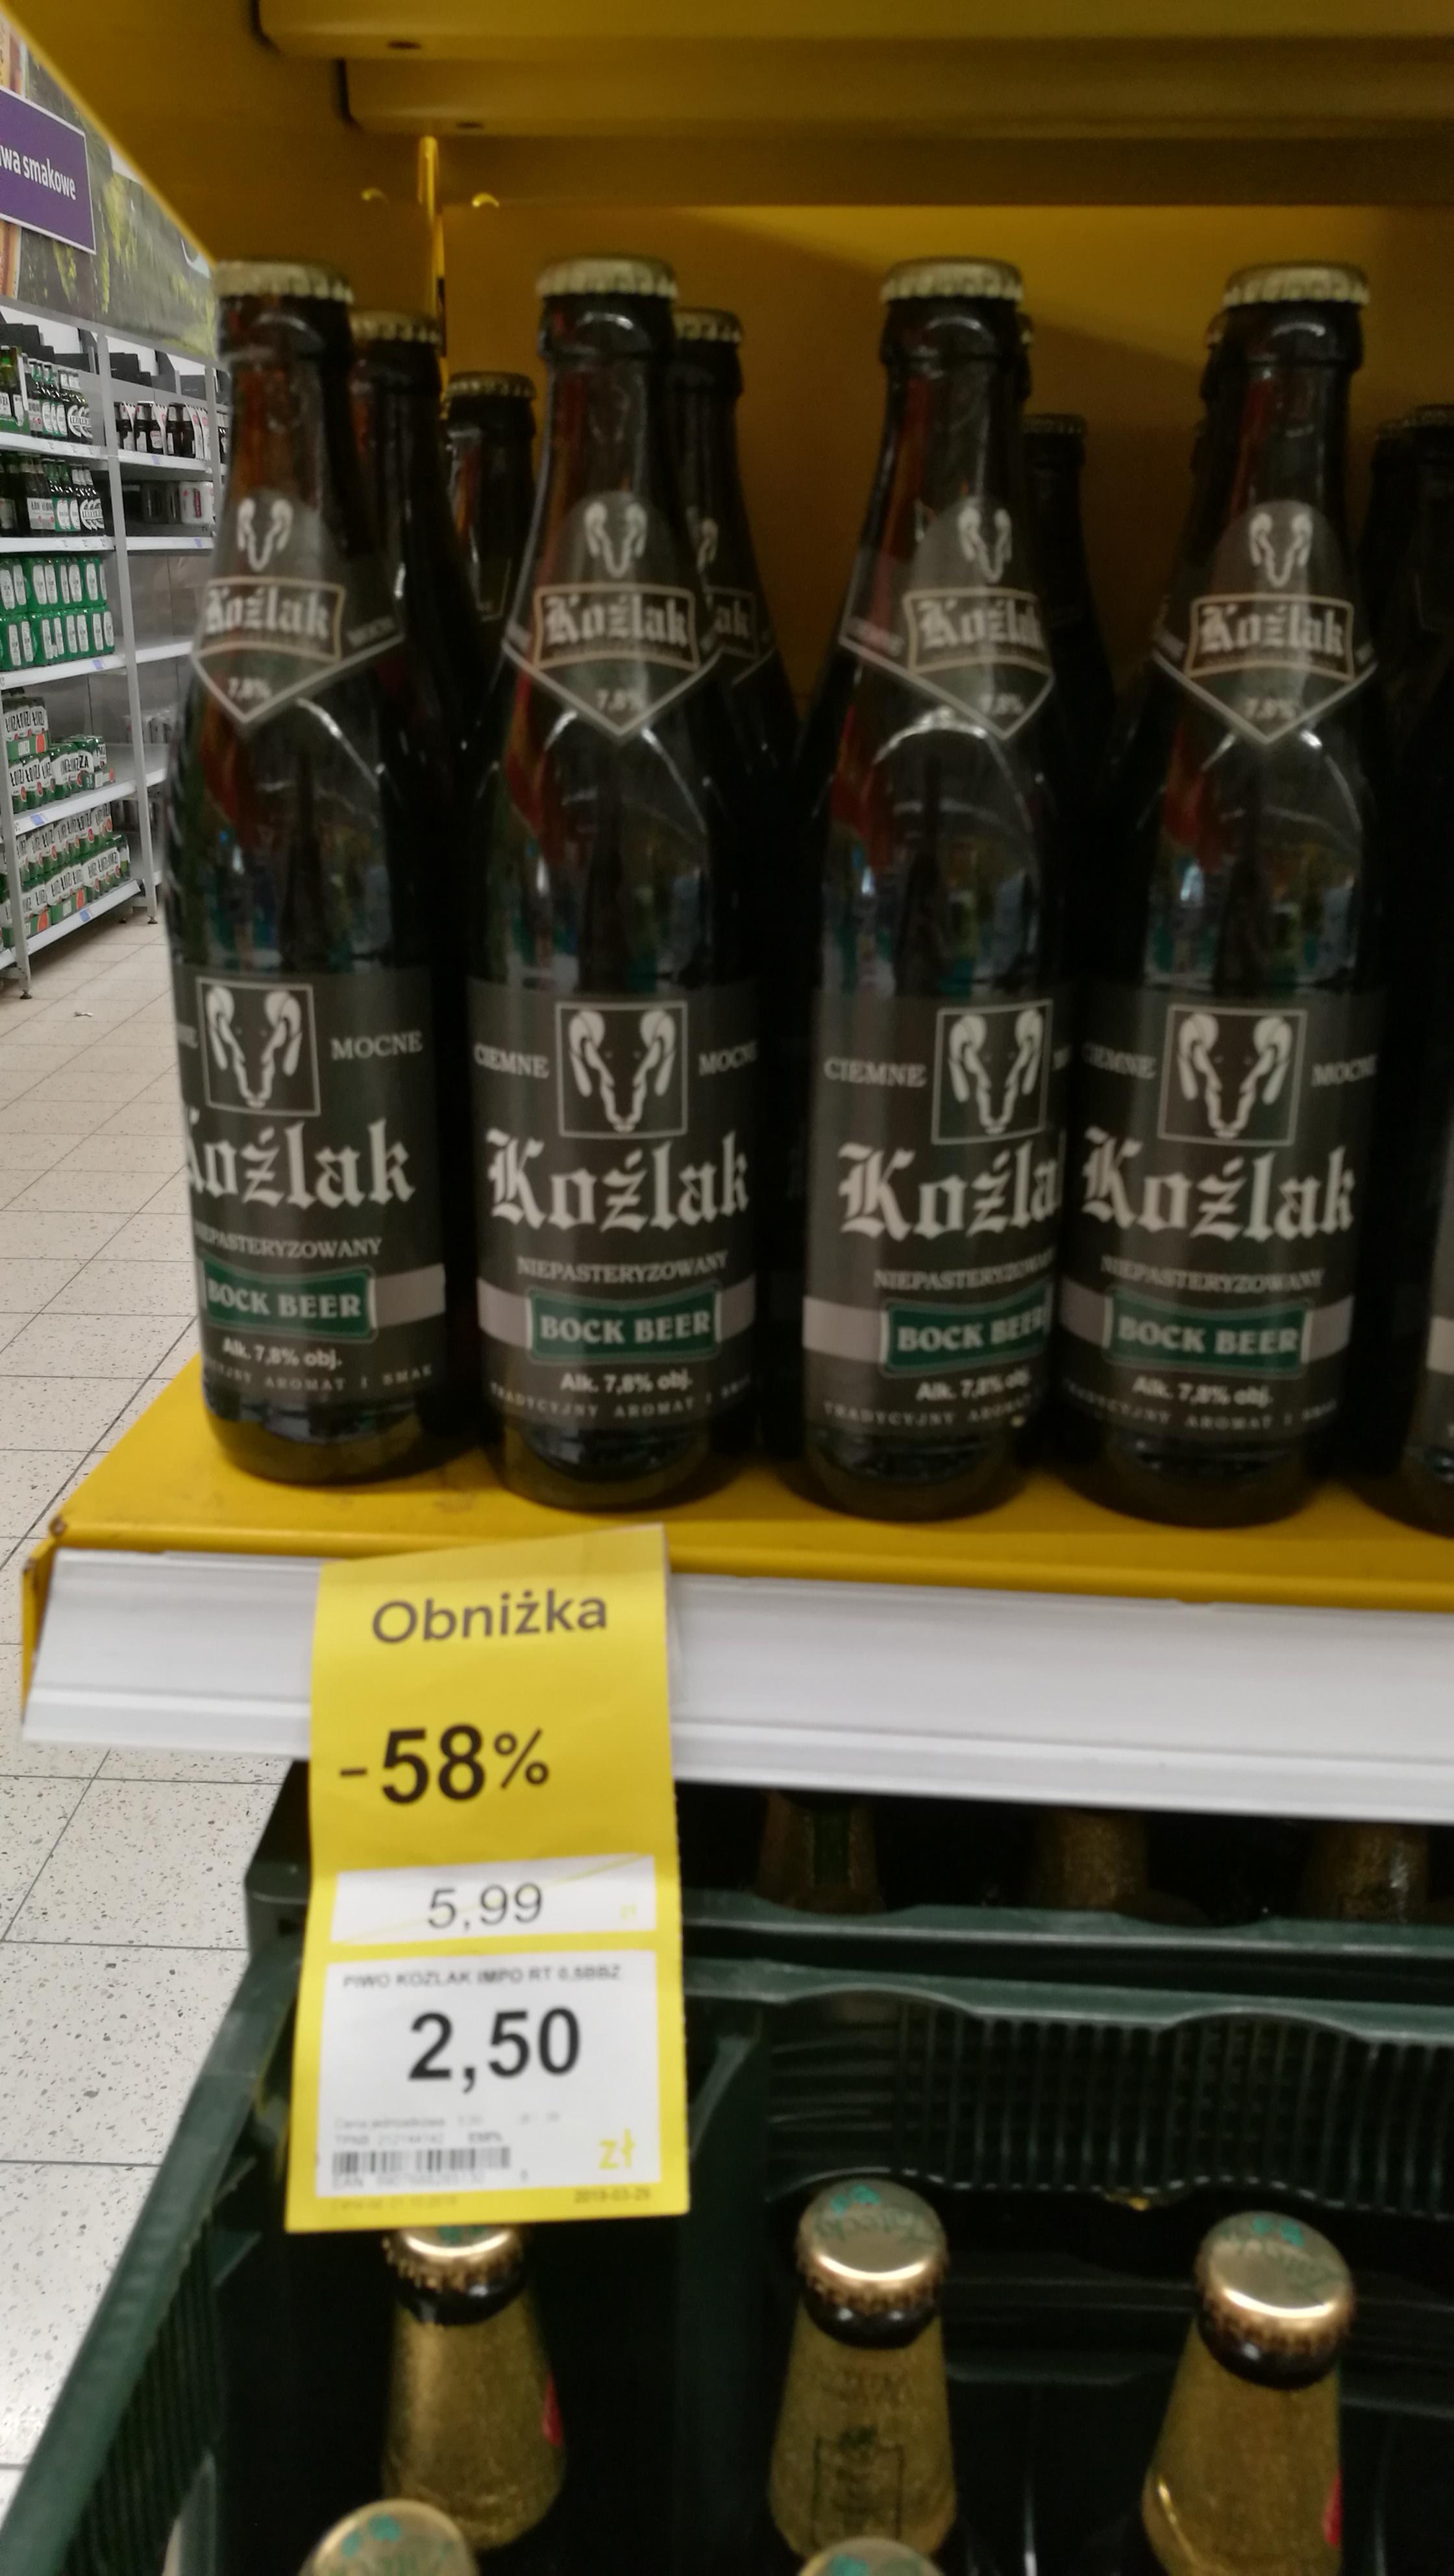 Piwo Koźlak Bock Beer Niepasteryzowany - Tesco Świdnica